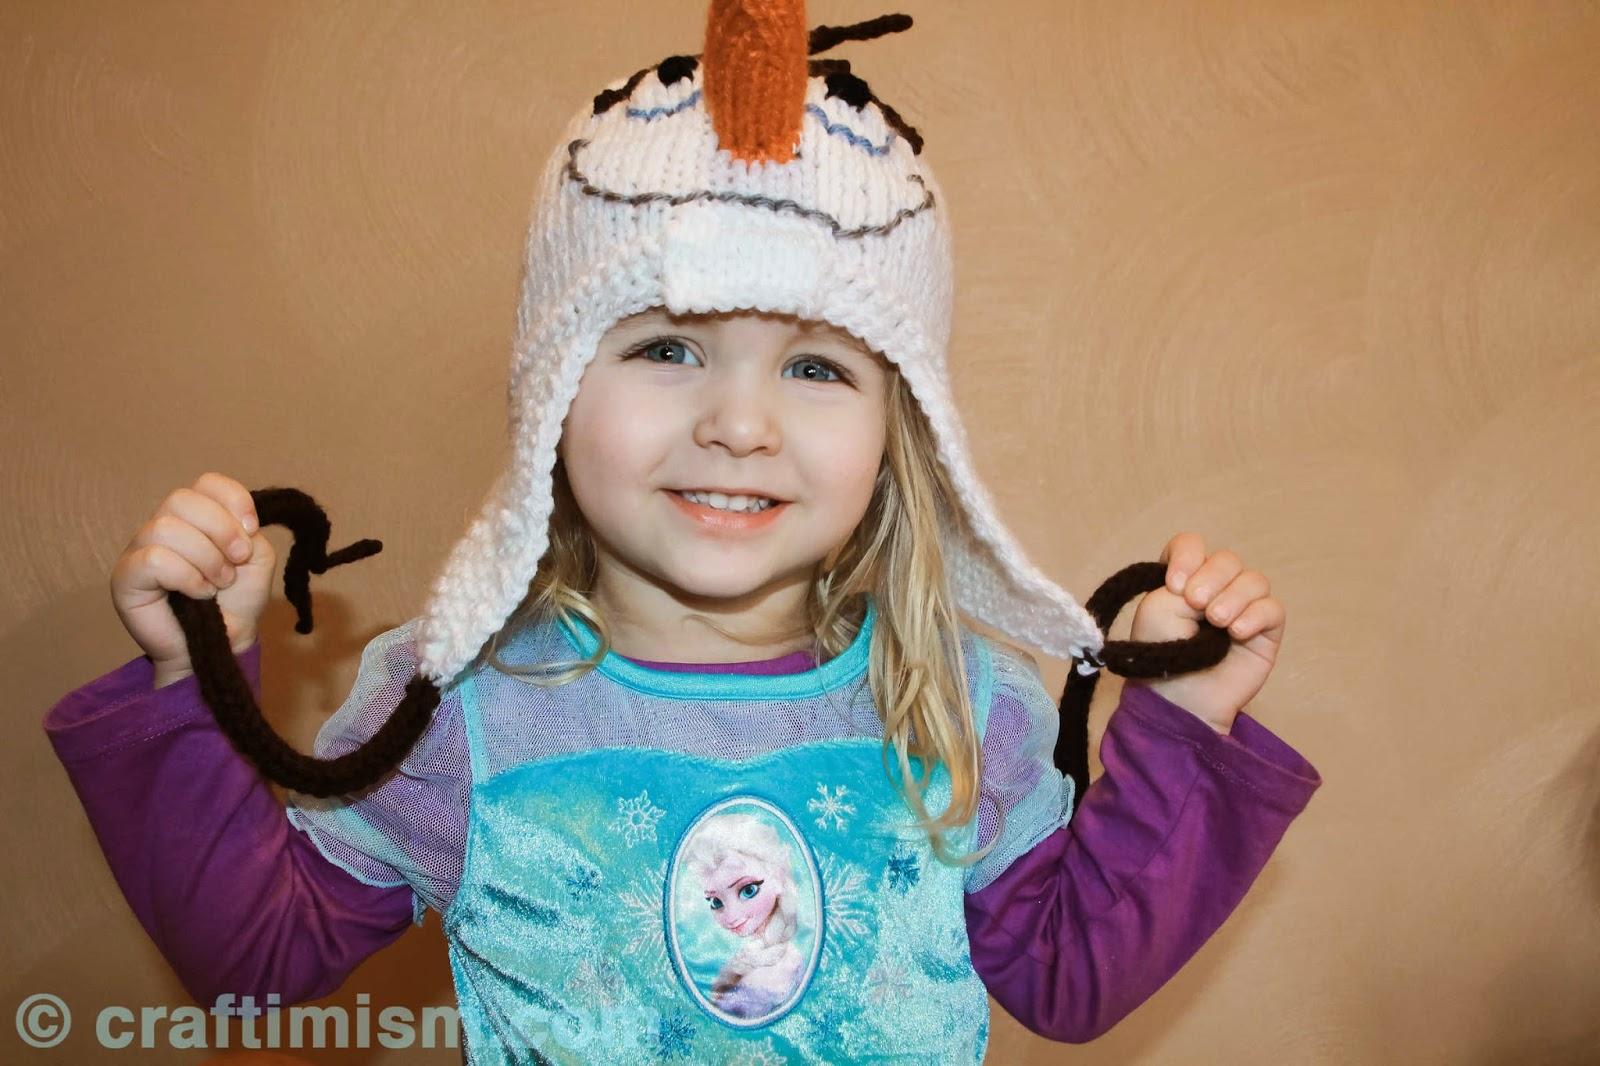 Knitting Pattern Olaf Hat : Craftimism: Olaf-inspired Knit Hat